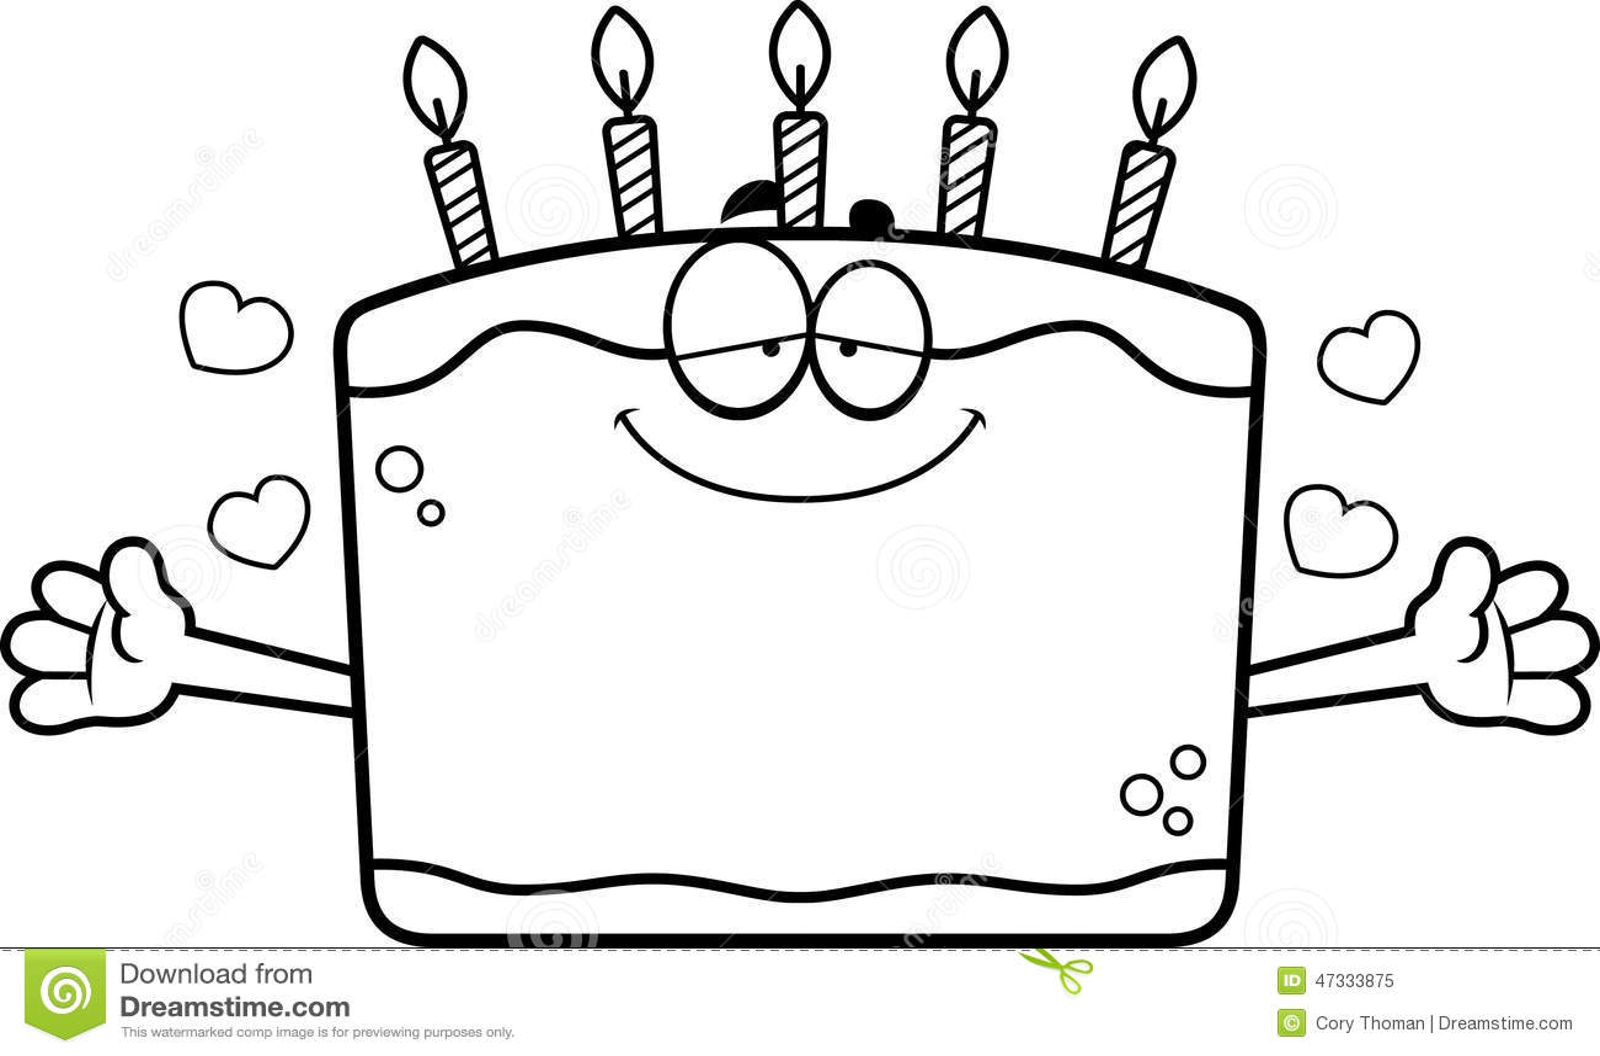 Cartoon Birthday Cake Hug Stock Vector Illustration Of